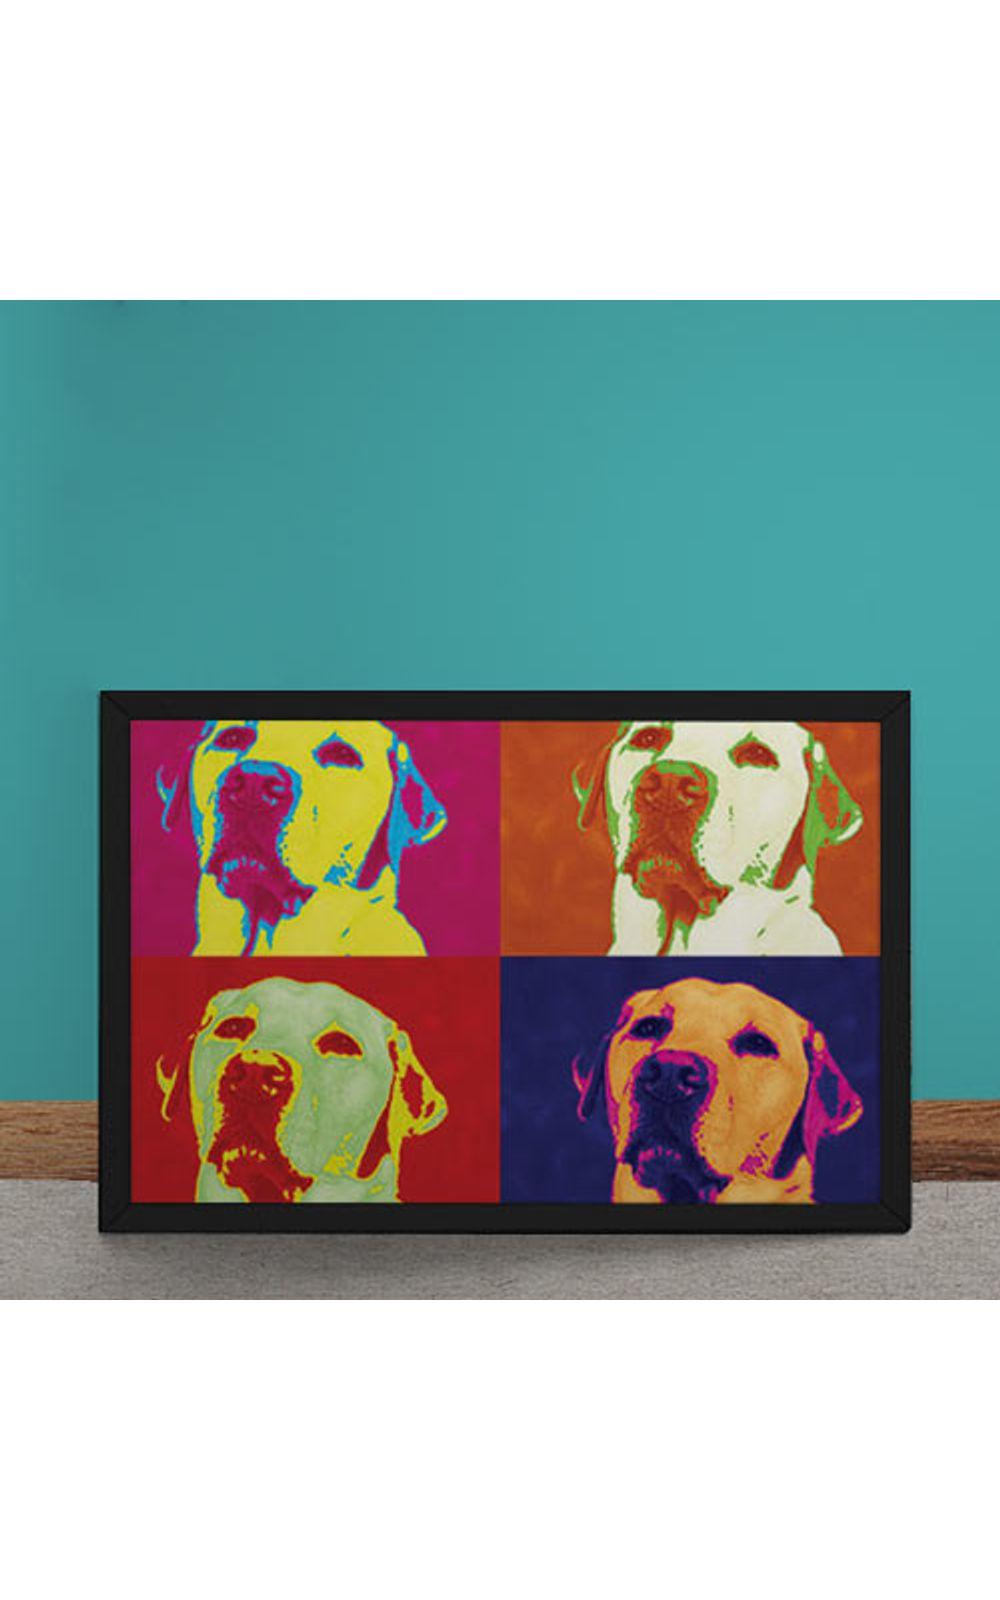 Foto 1 - Quadro Decorativo Andy Warhol Pop Art Cachorro Labrador